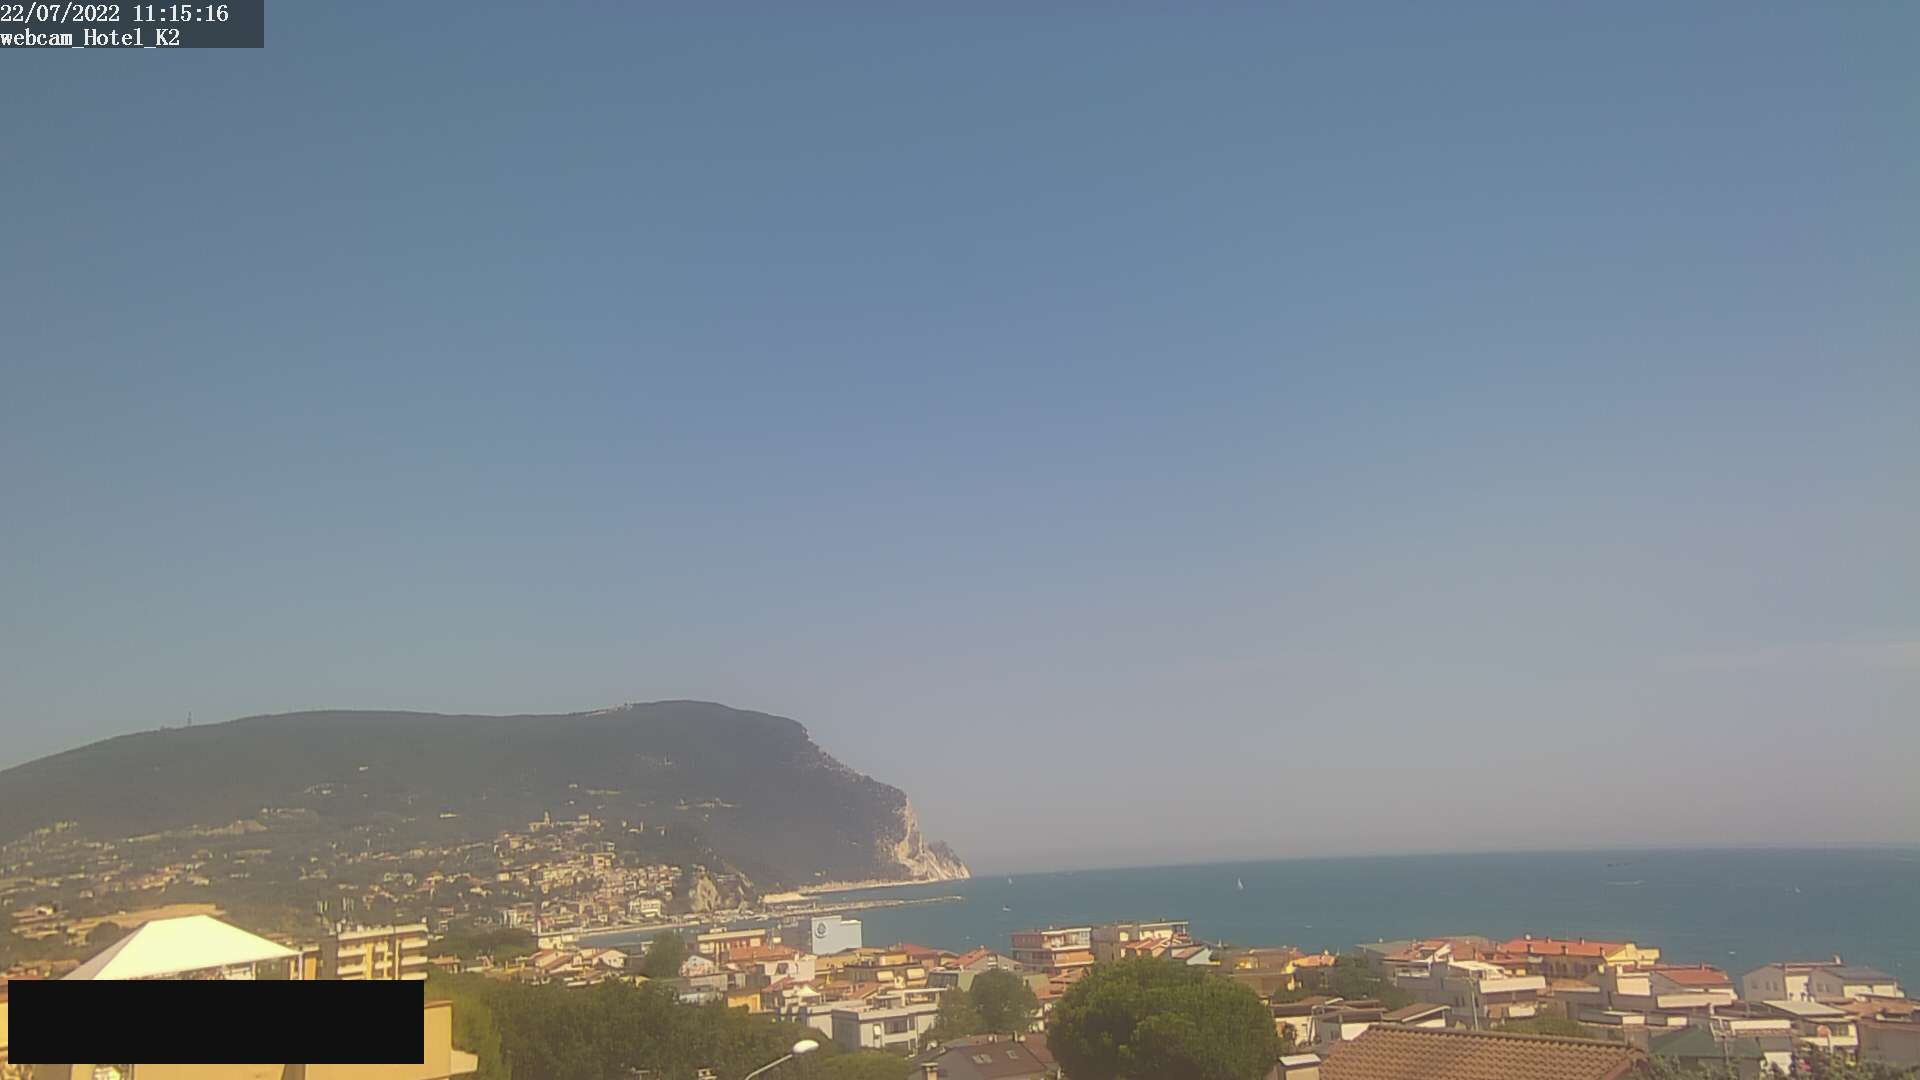 Numana, Ancona – Hotel K2